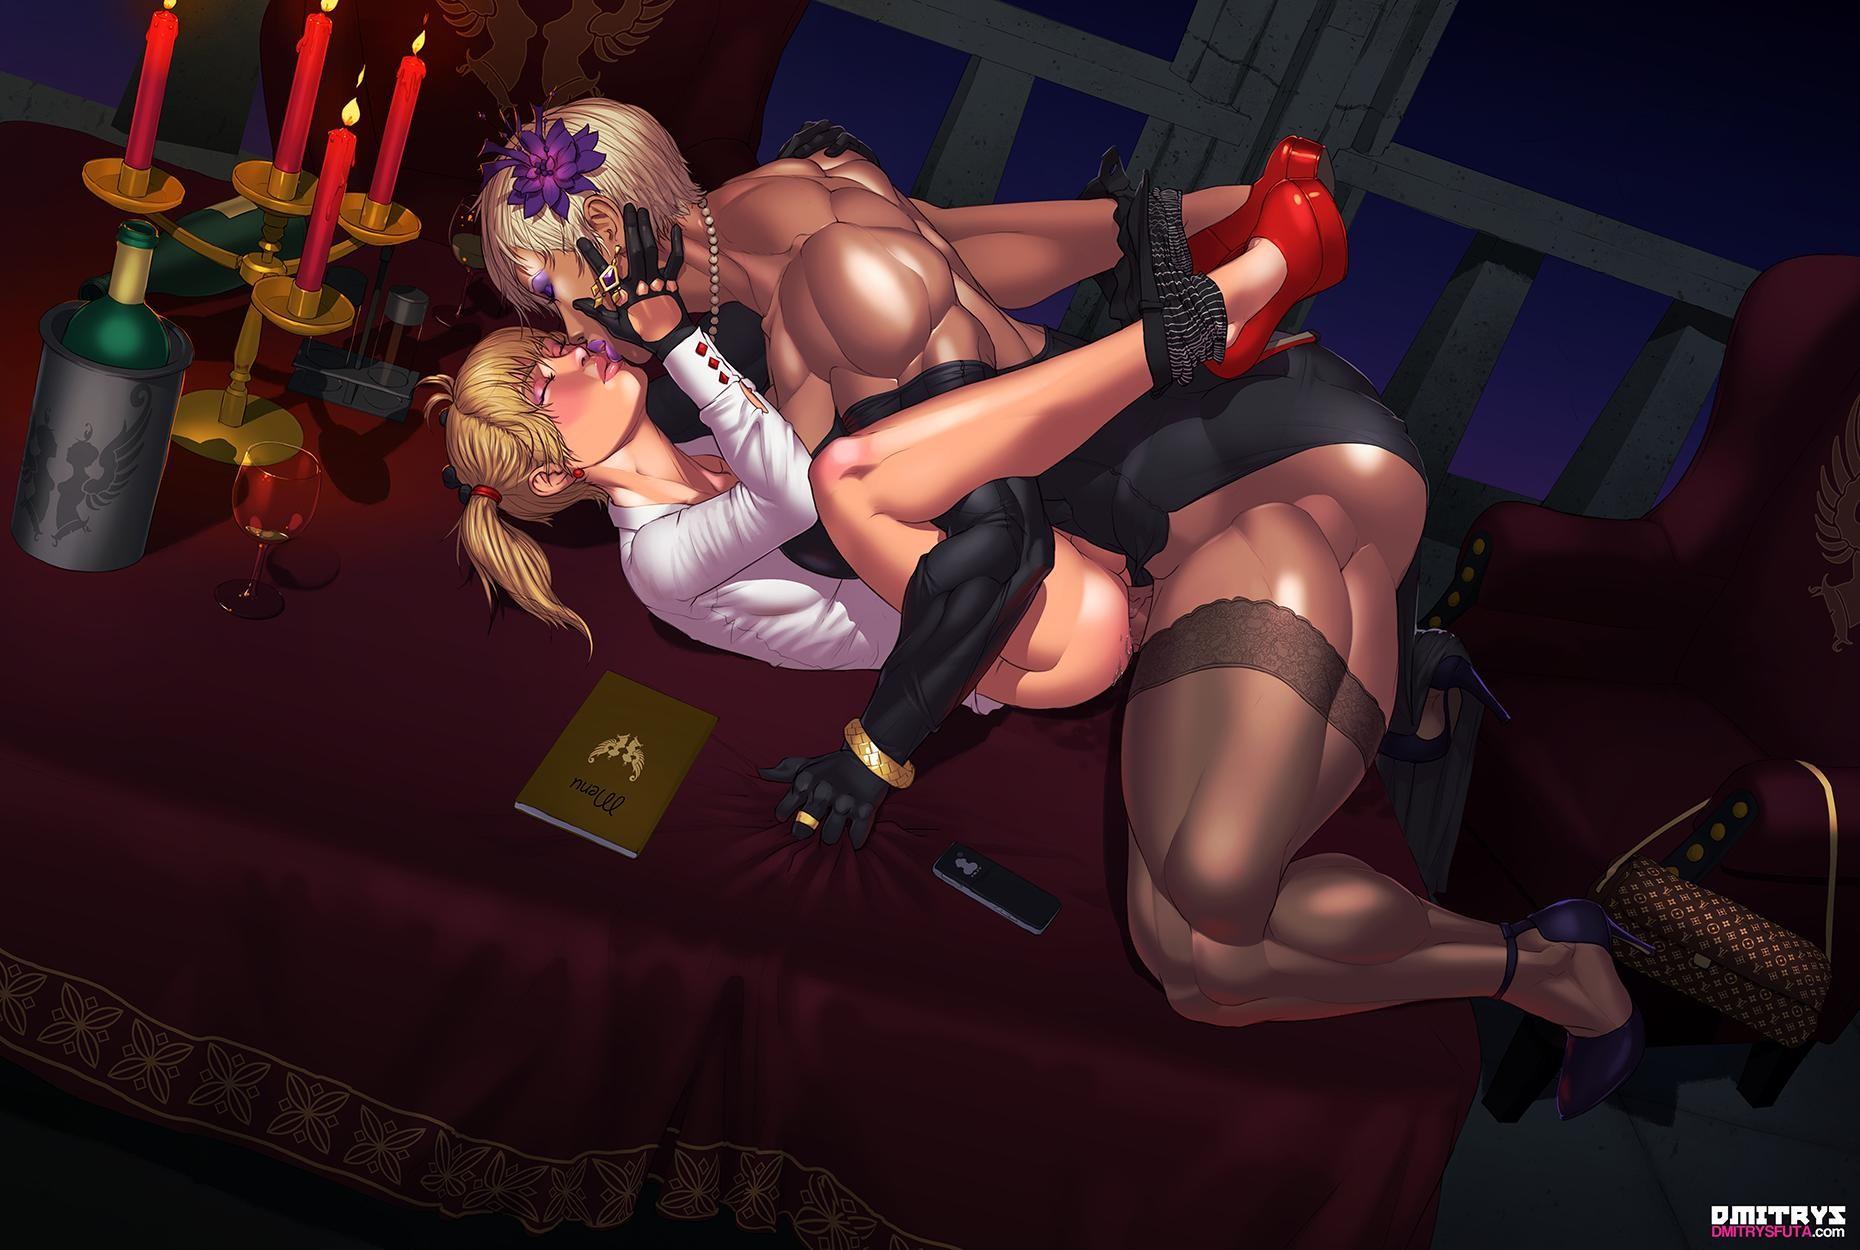 Dmitrys futa free porn pichunter